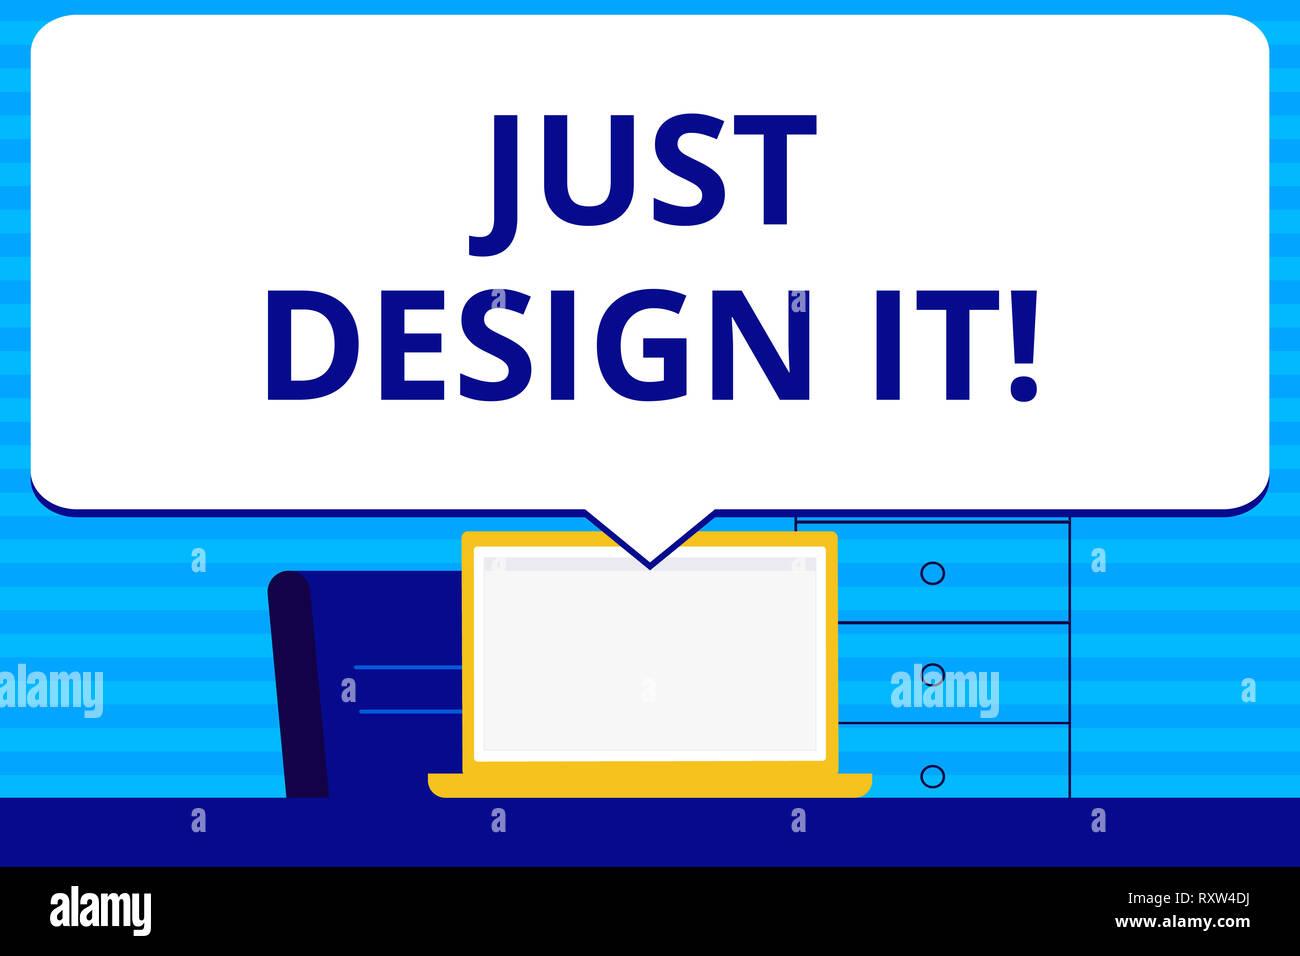 Graphic Design Workspace Digital Sketching Stock Photos & Graphic